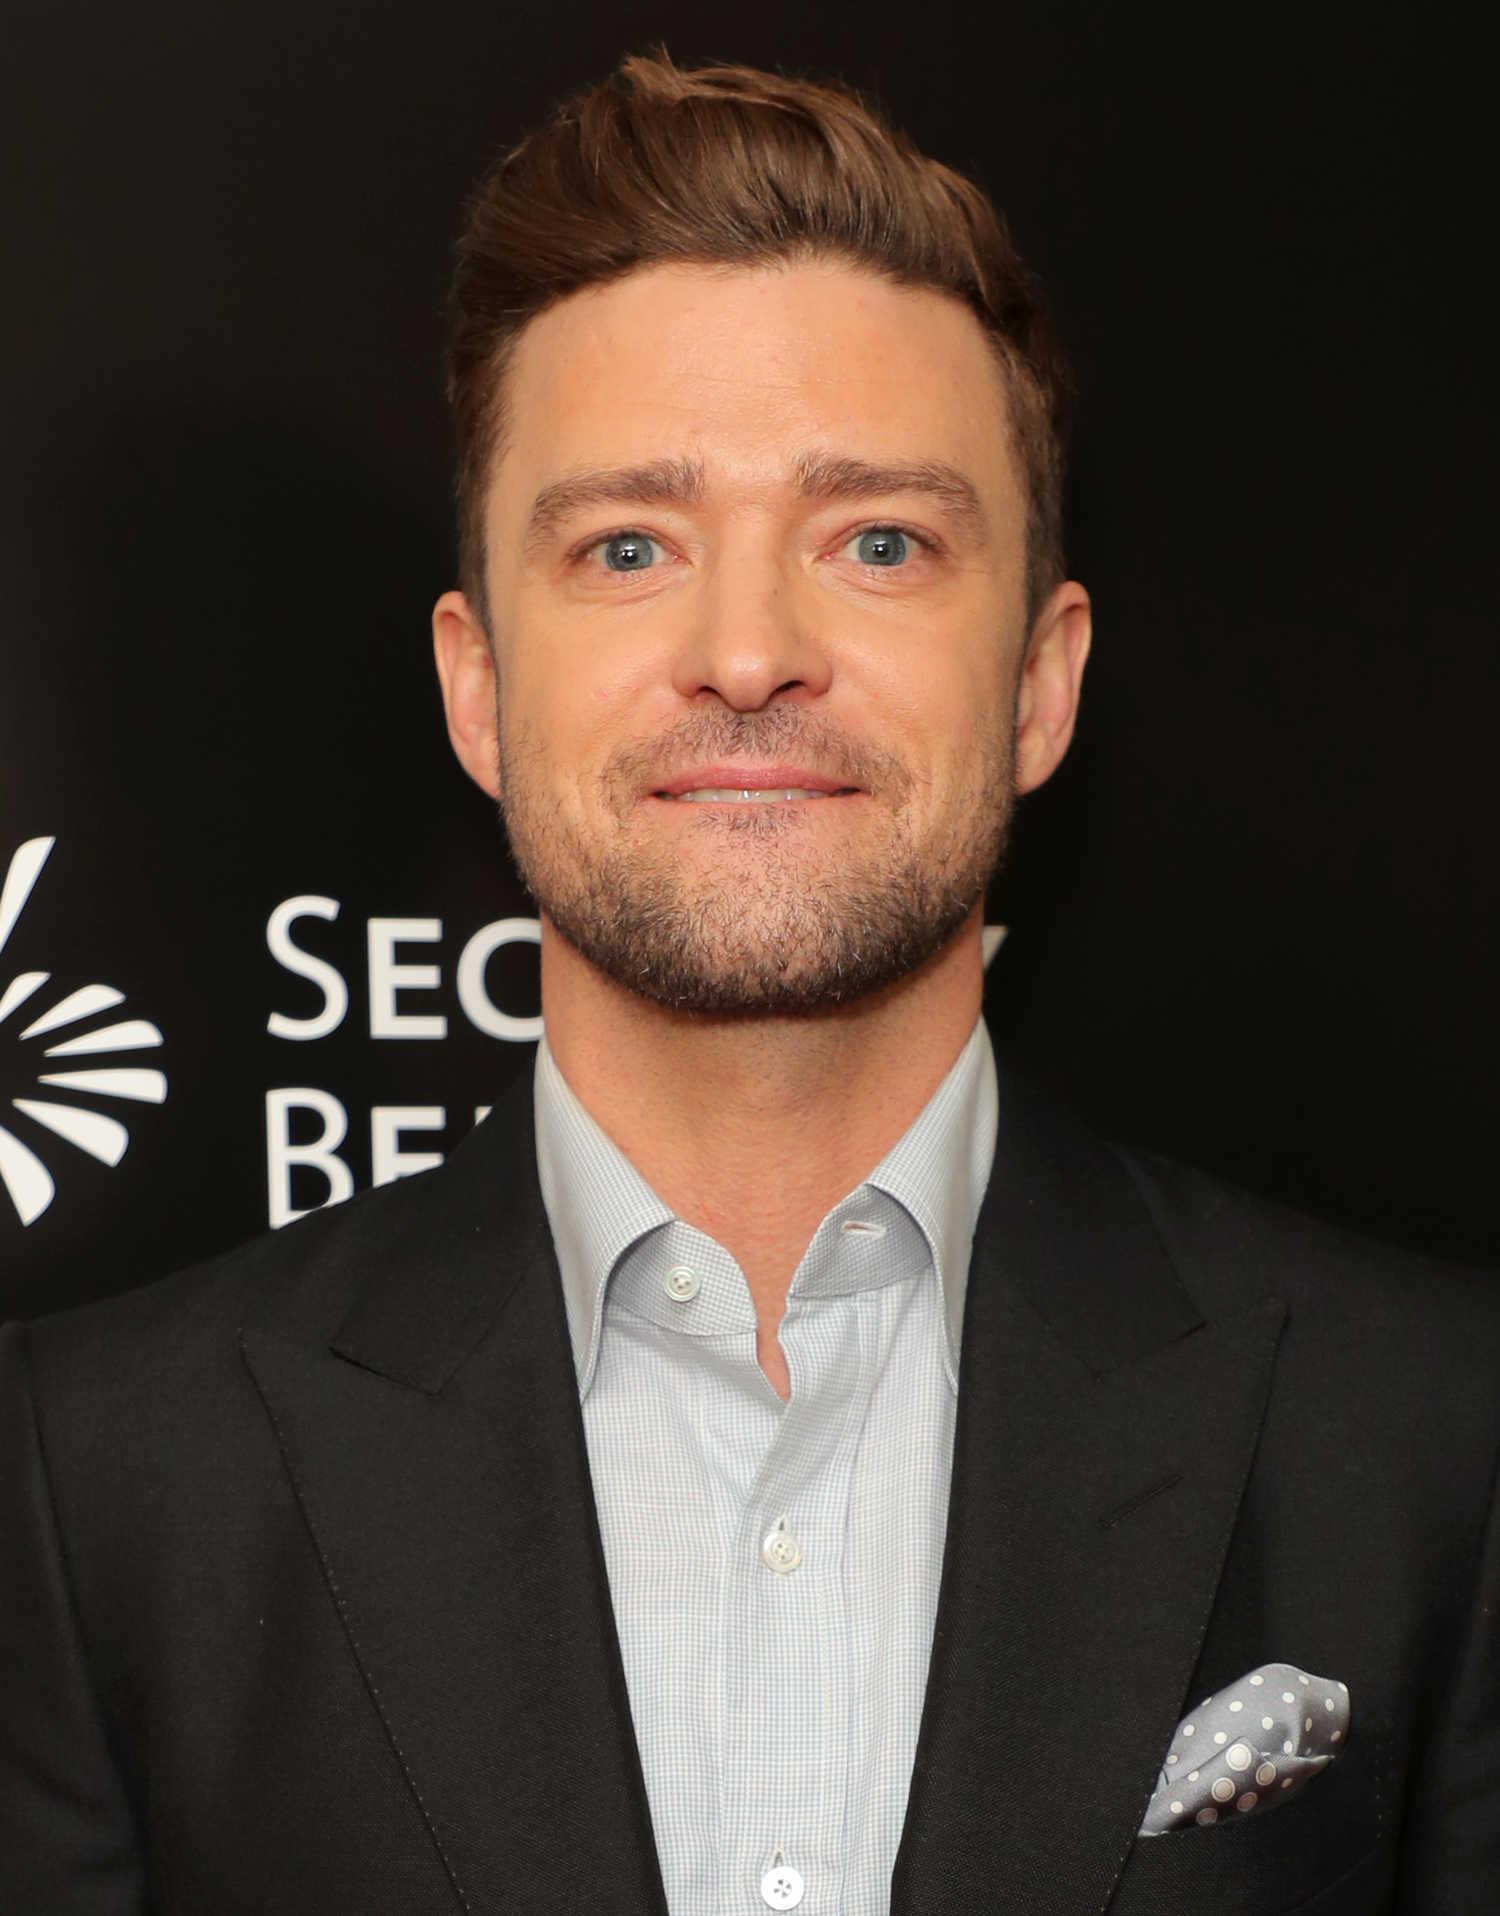 Justin Timberlake at the Trolls Australian Premiere in